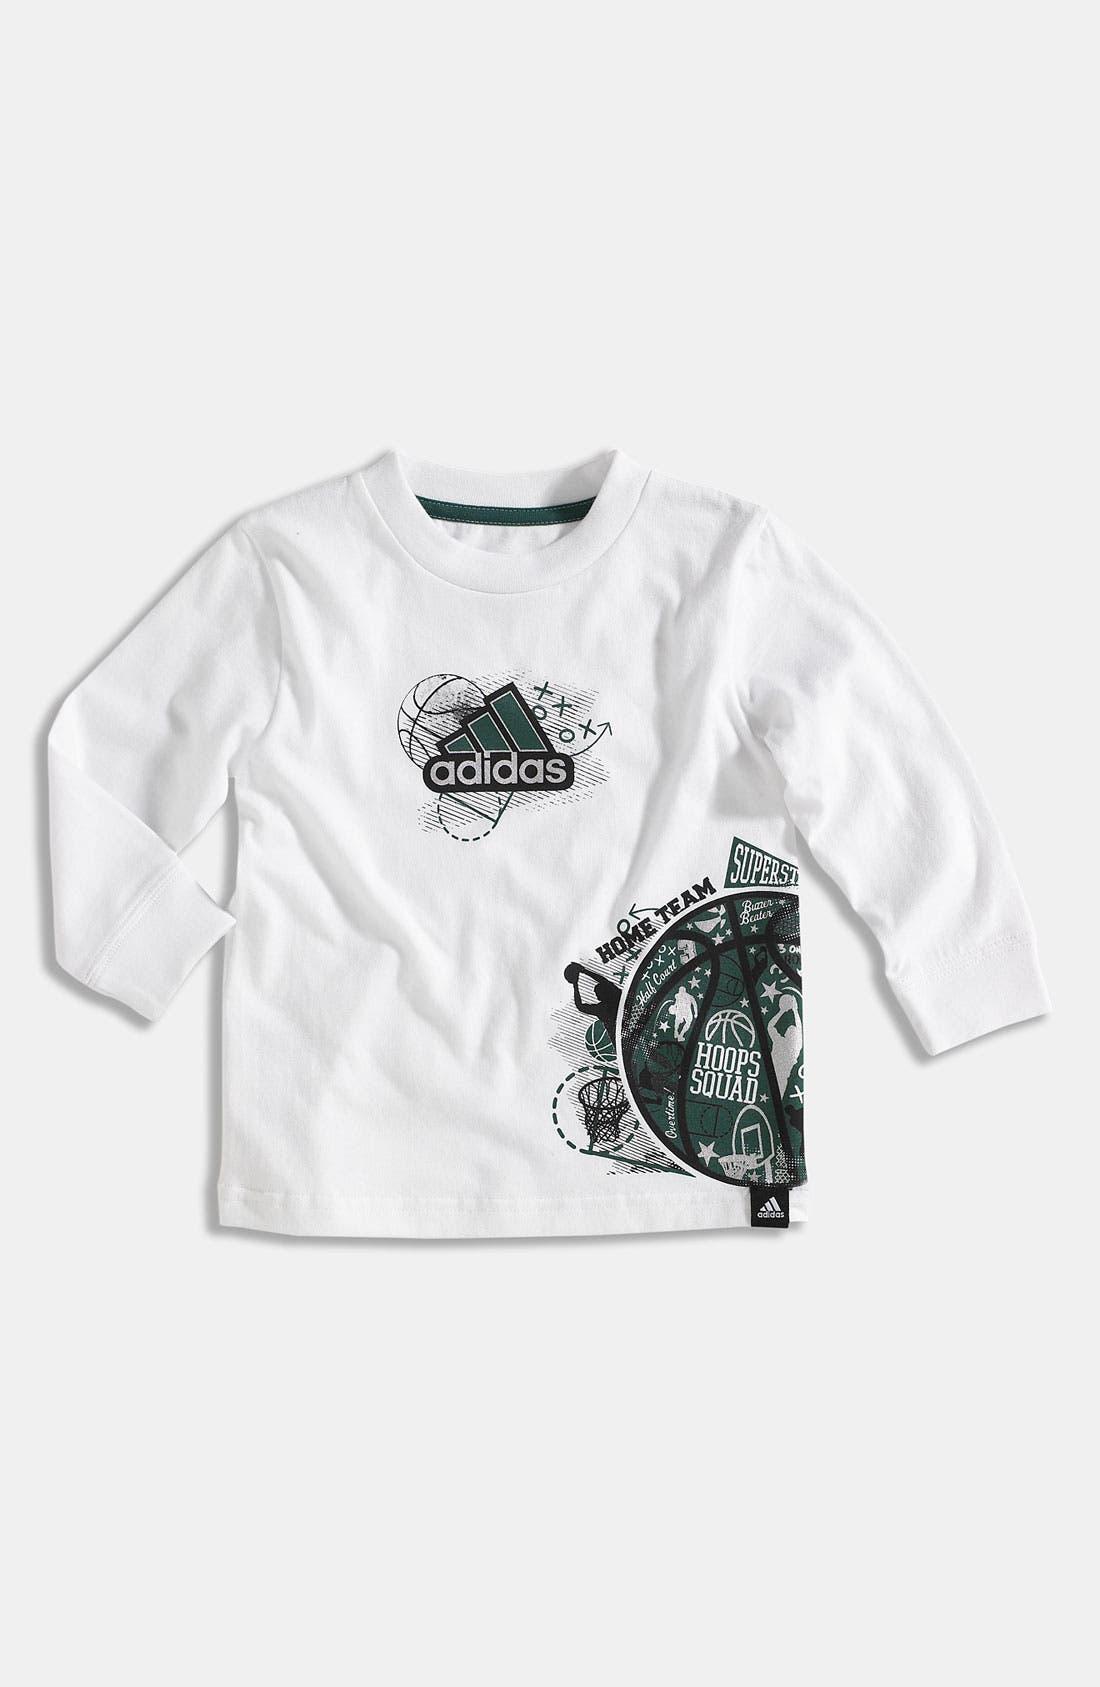 Main Image - adidas 'Playbook' T-Shirt (Toddler)